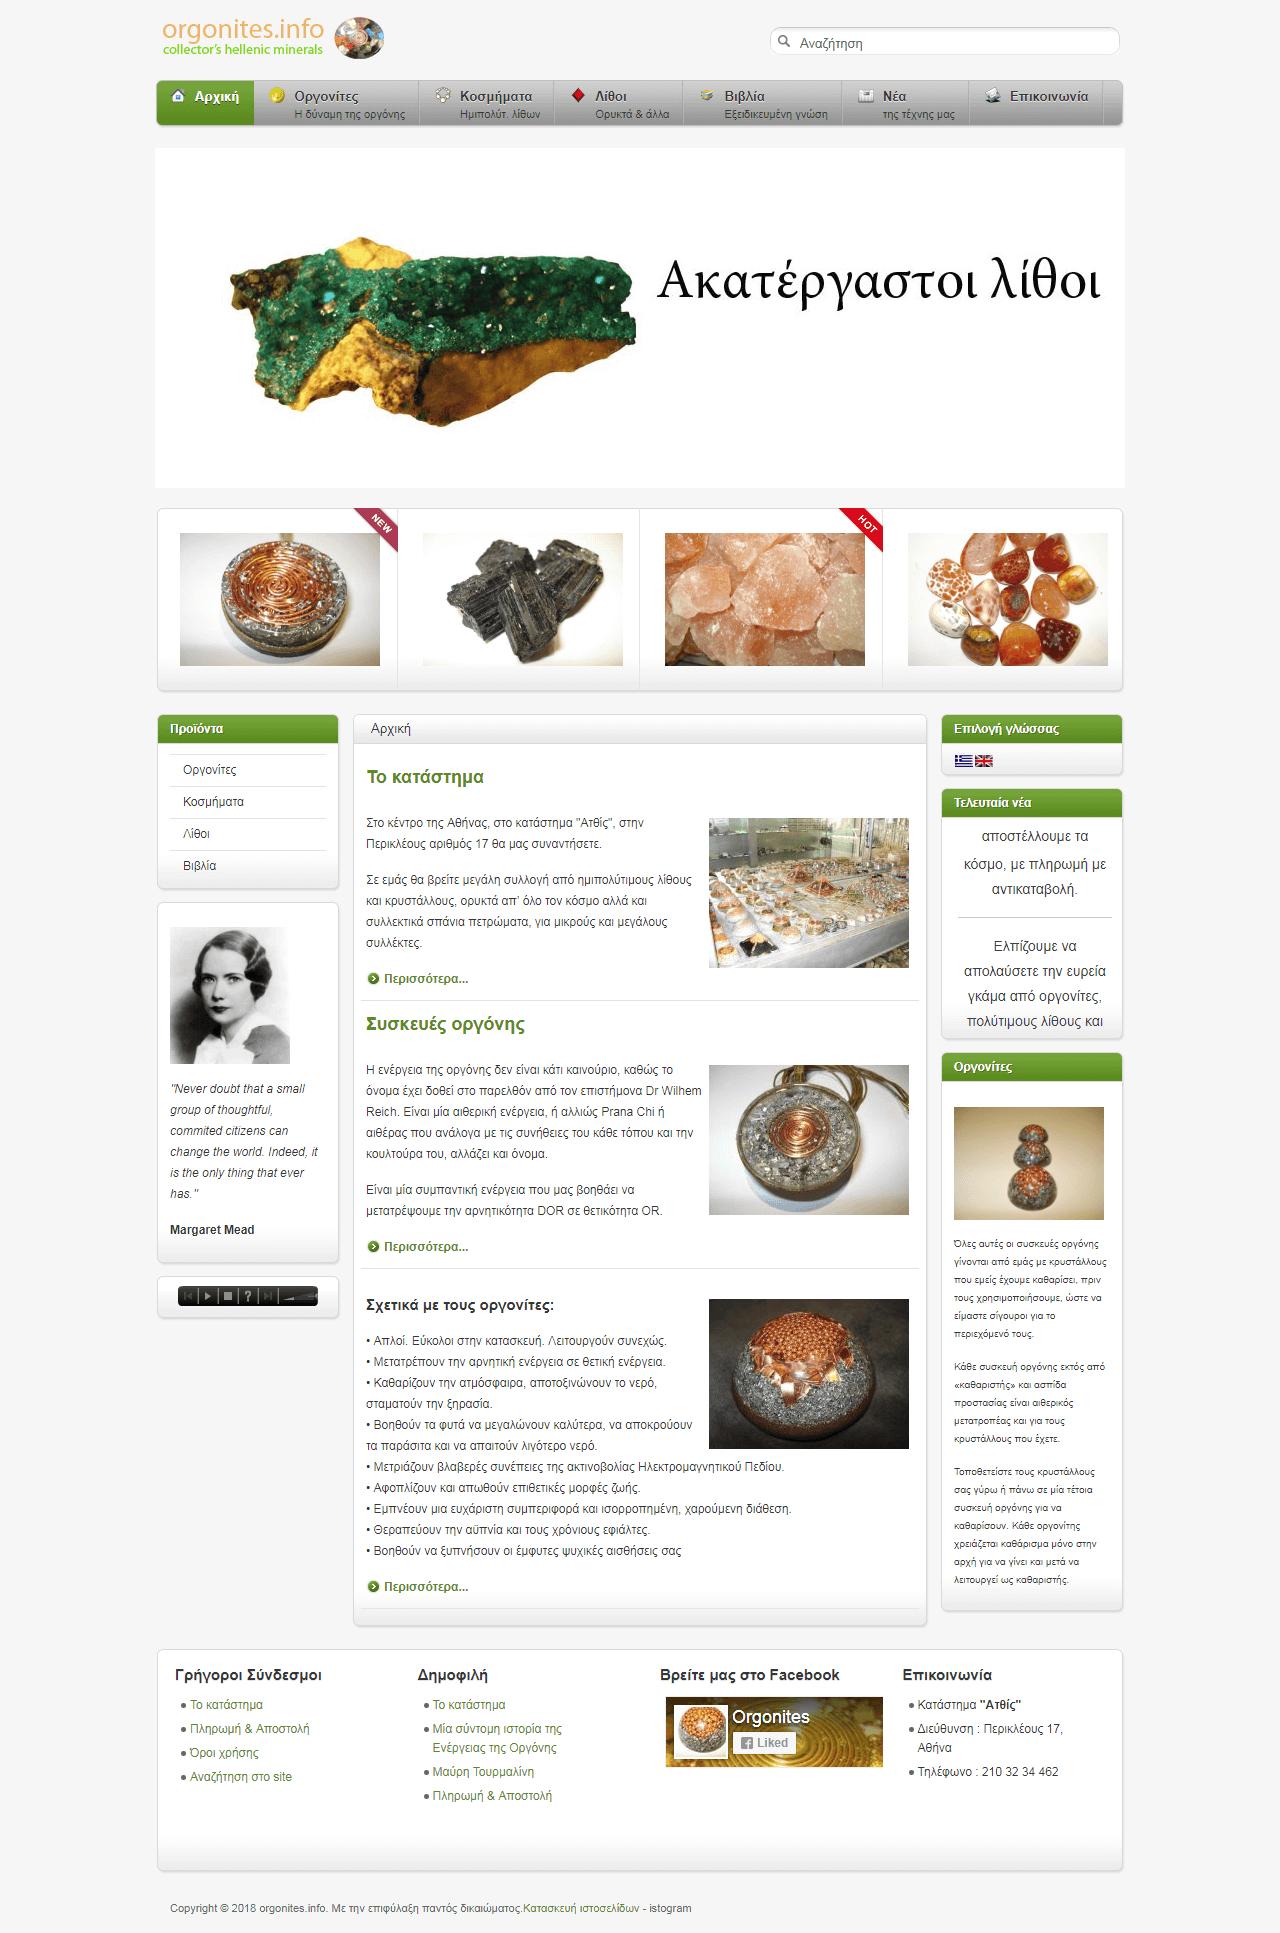 orgonites_info_website